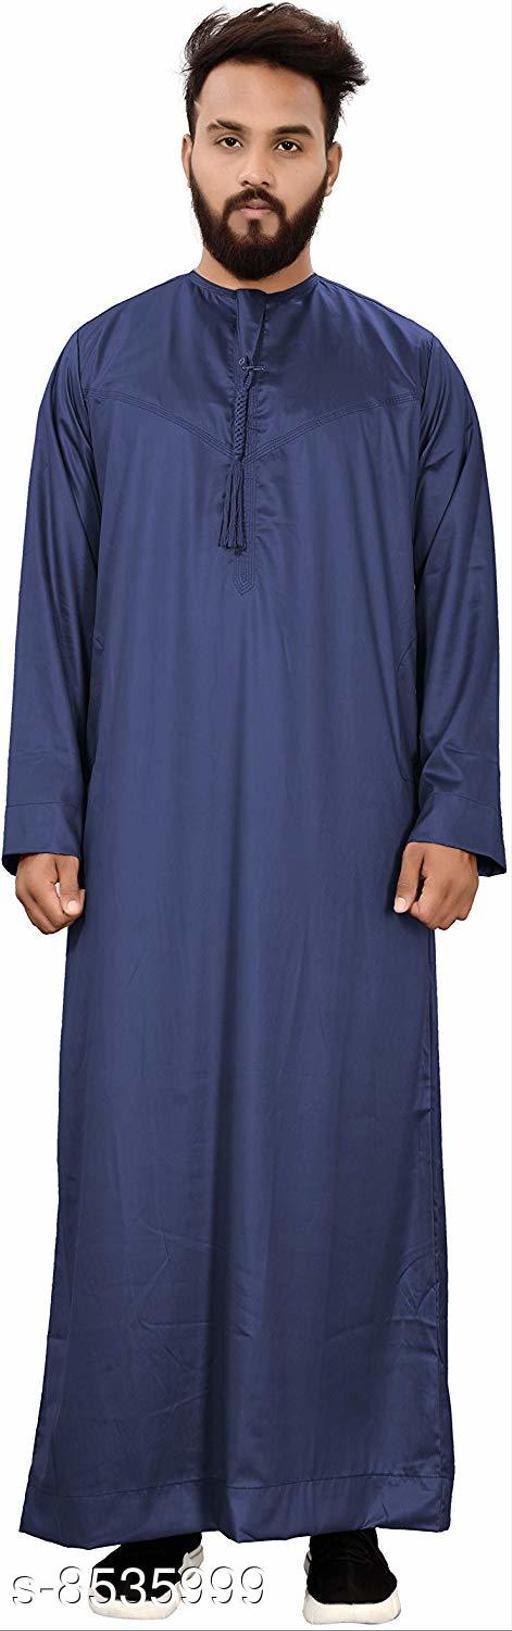 Kurta Sets Trendy Jubba Men's Ethnic Wear  *Fabric* Cotton  *Combo of* Single  *Sizes*  L, XXXL  *Sizes Available* L, XXXL *    Catalog Name: Unique Men Kurtas CatalogID_1443505 C66-SC1201 Code: 048-8535999-